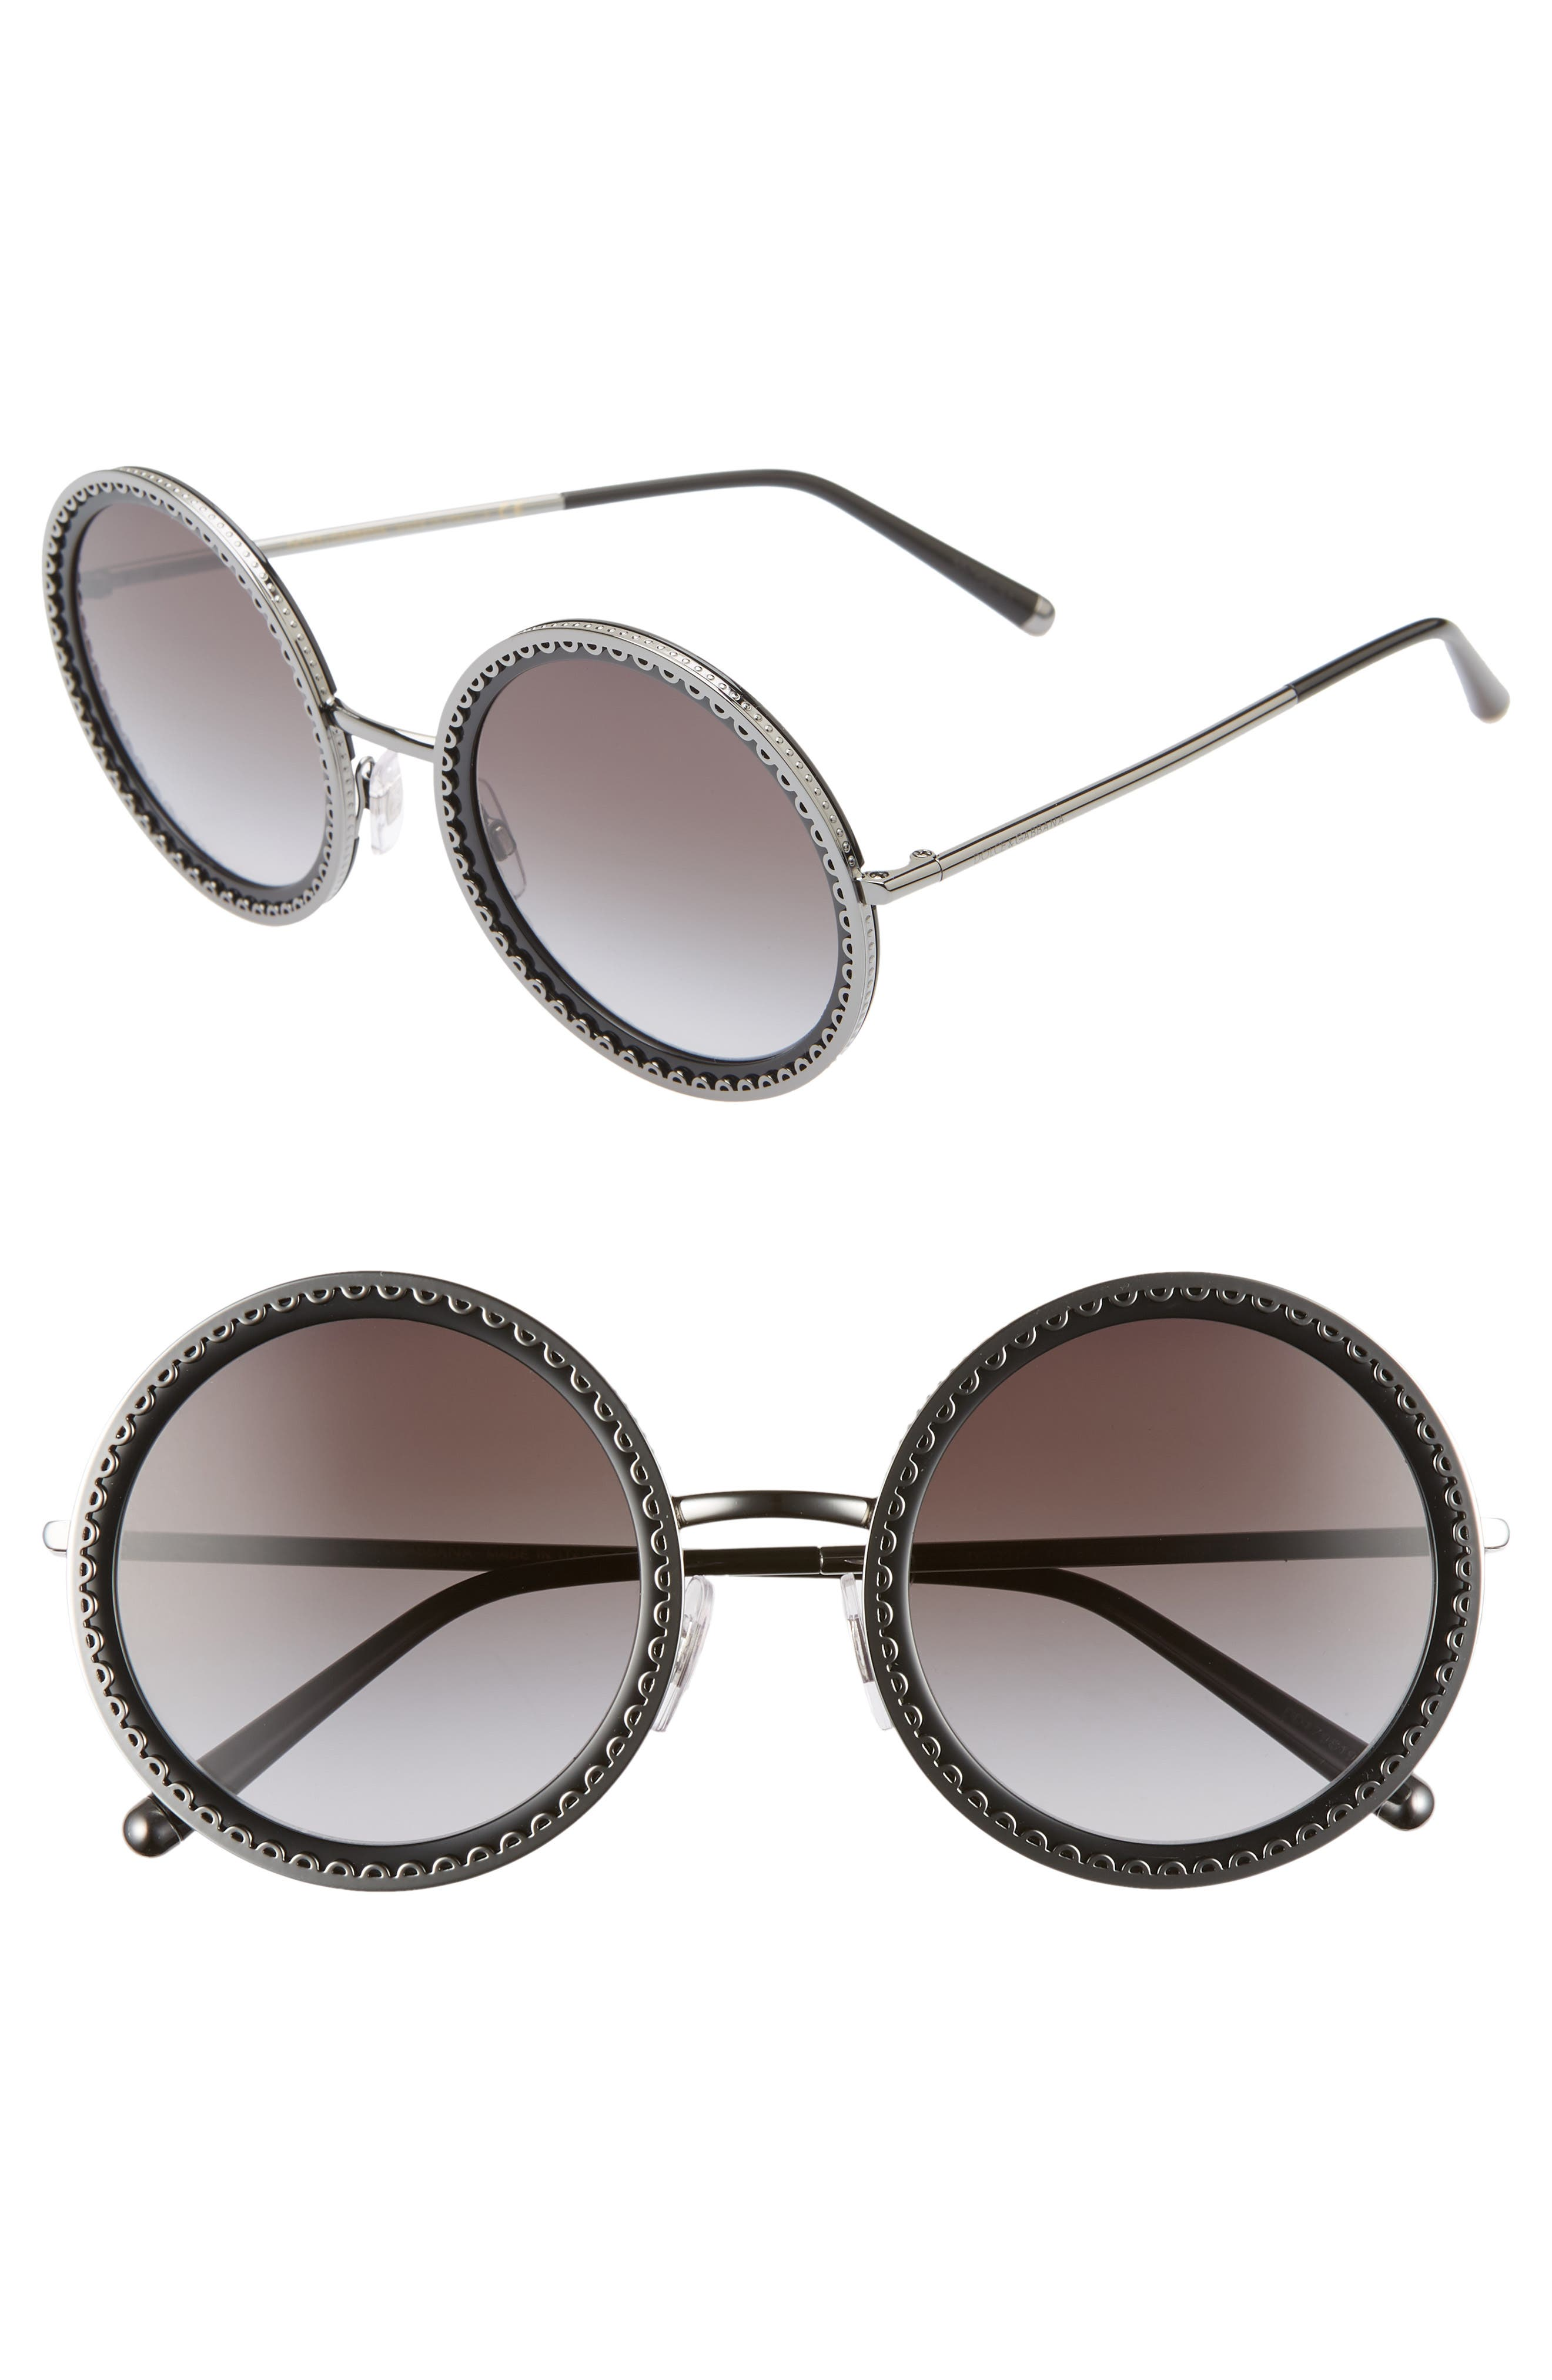 Sacred Heart 53mm Gradient Round Sunglasses,                             Main thumbnail 1, color,                             DARK GUNMETAL GRADIENT